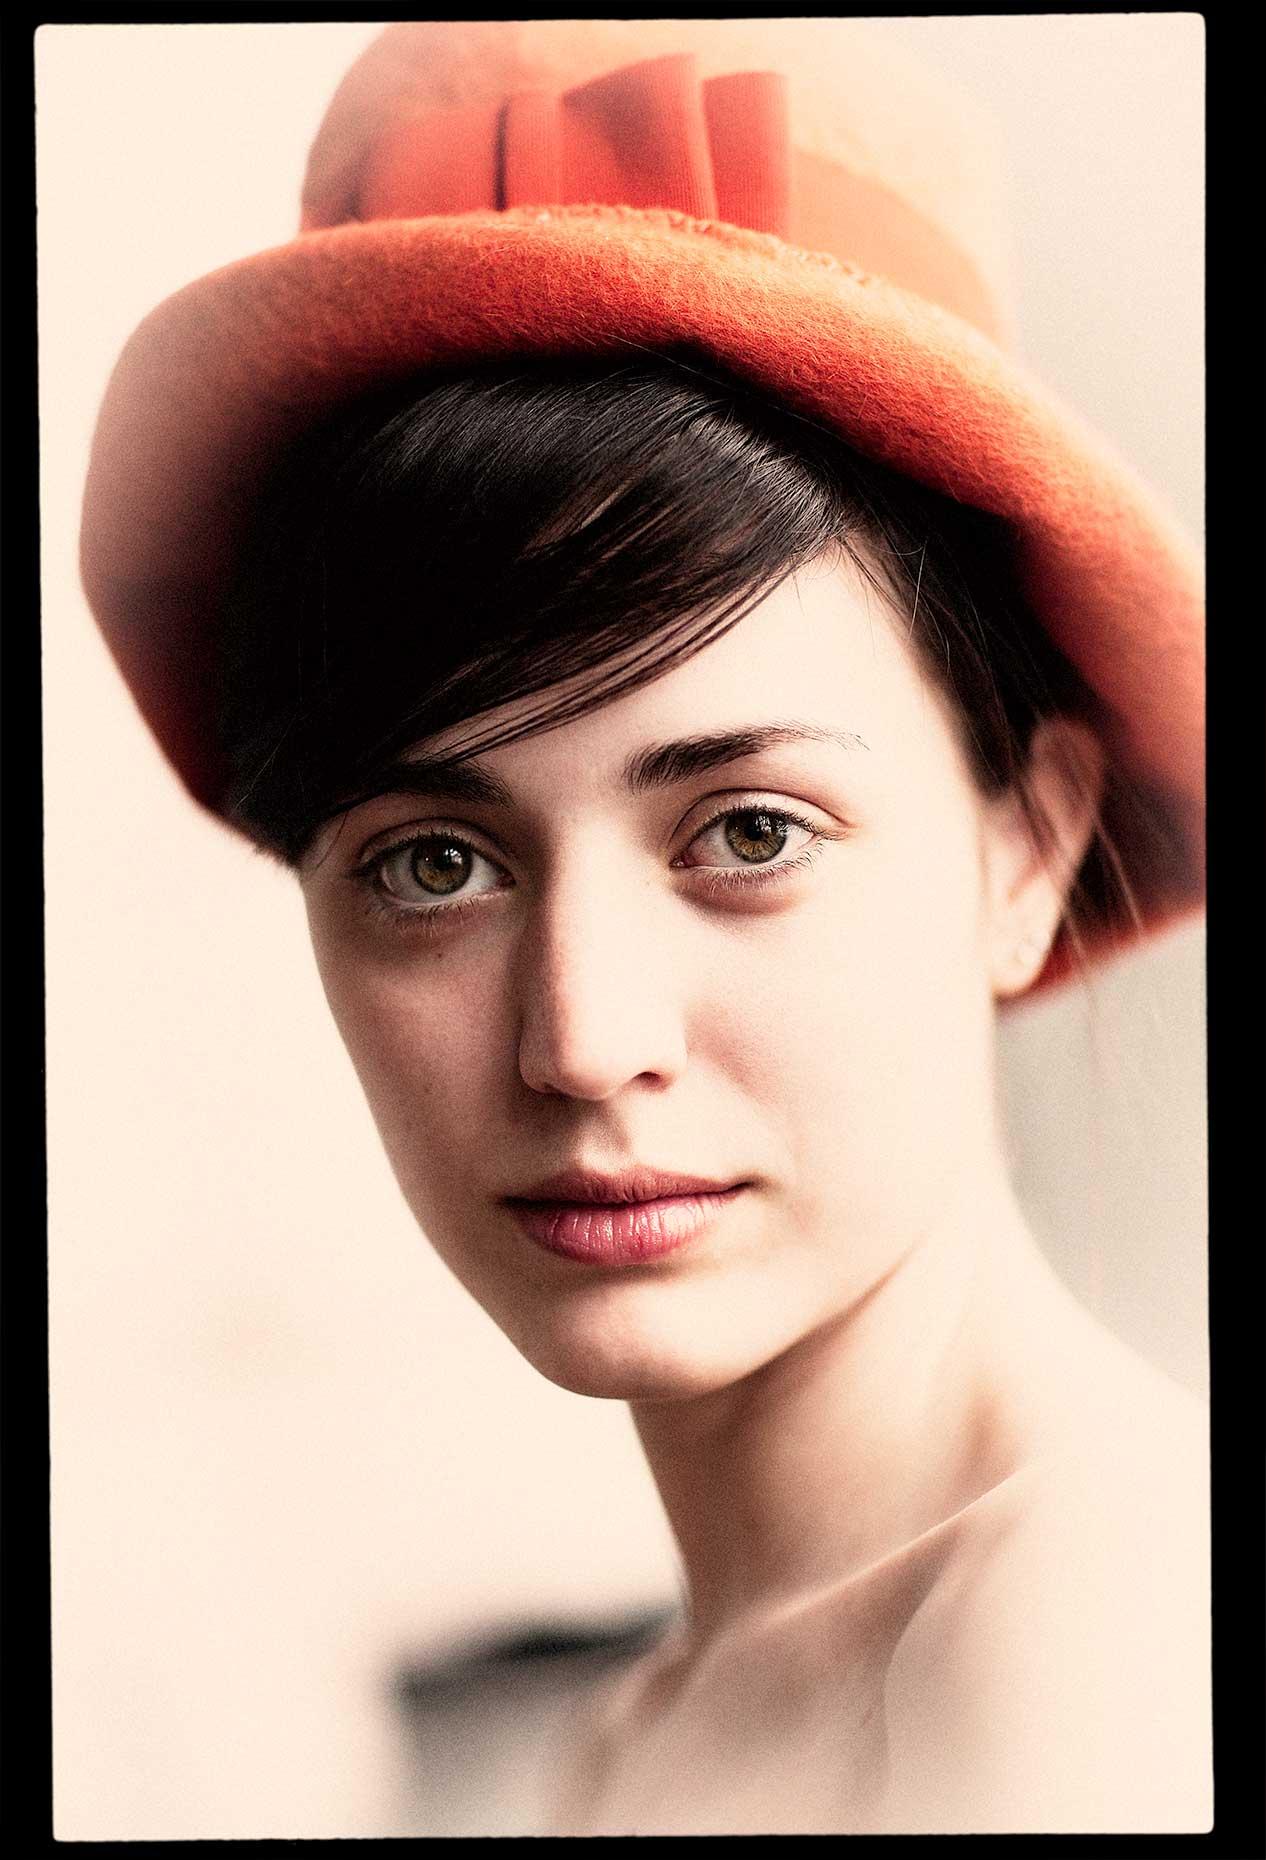 0901_dwpp-beauty_orange-hat_1493_original.jpg